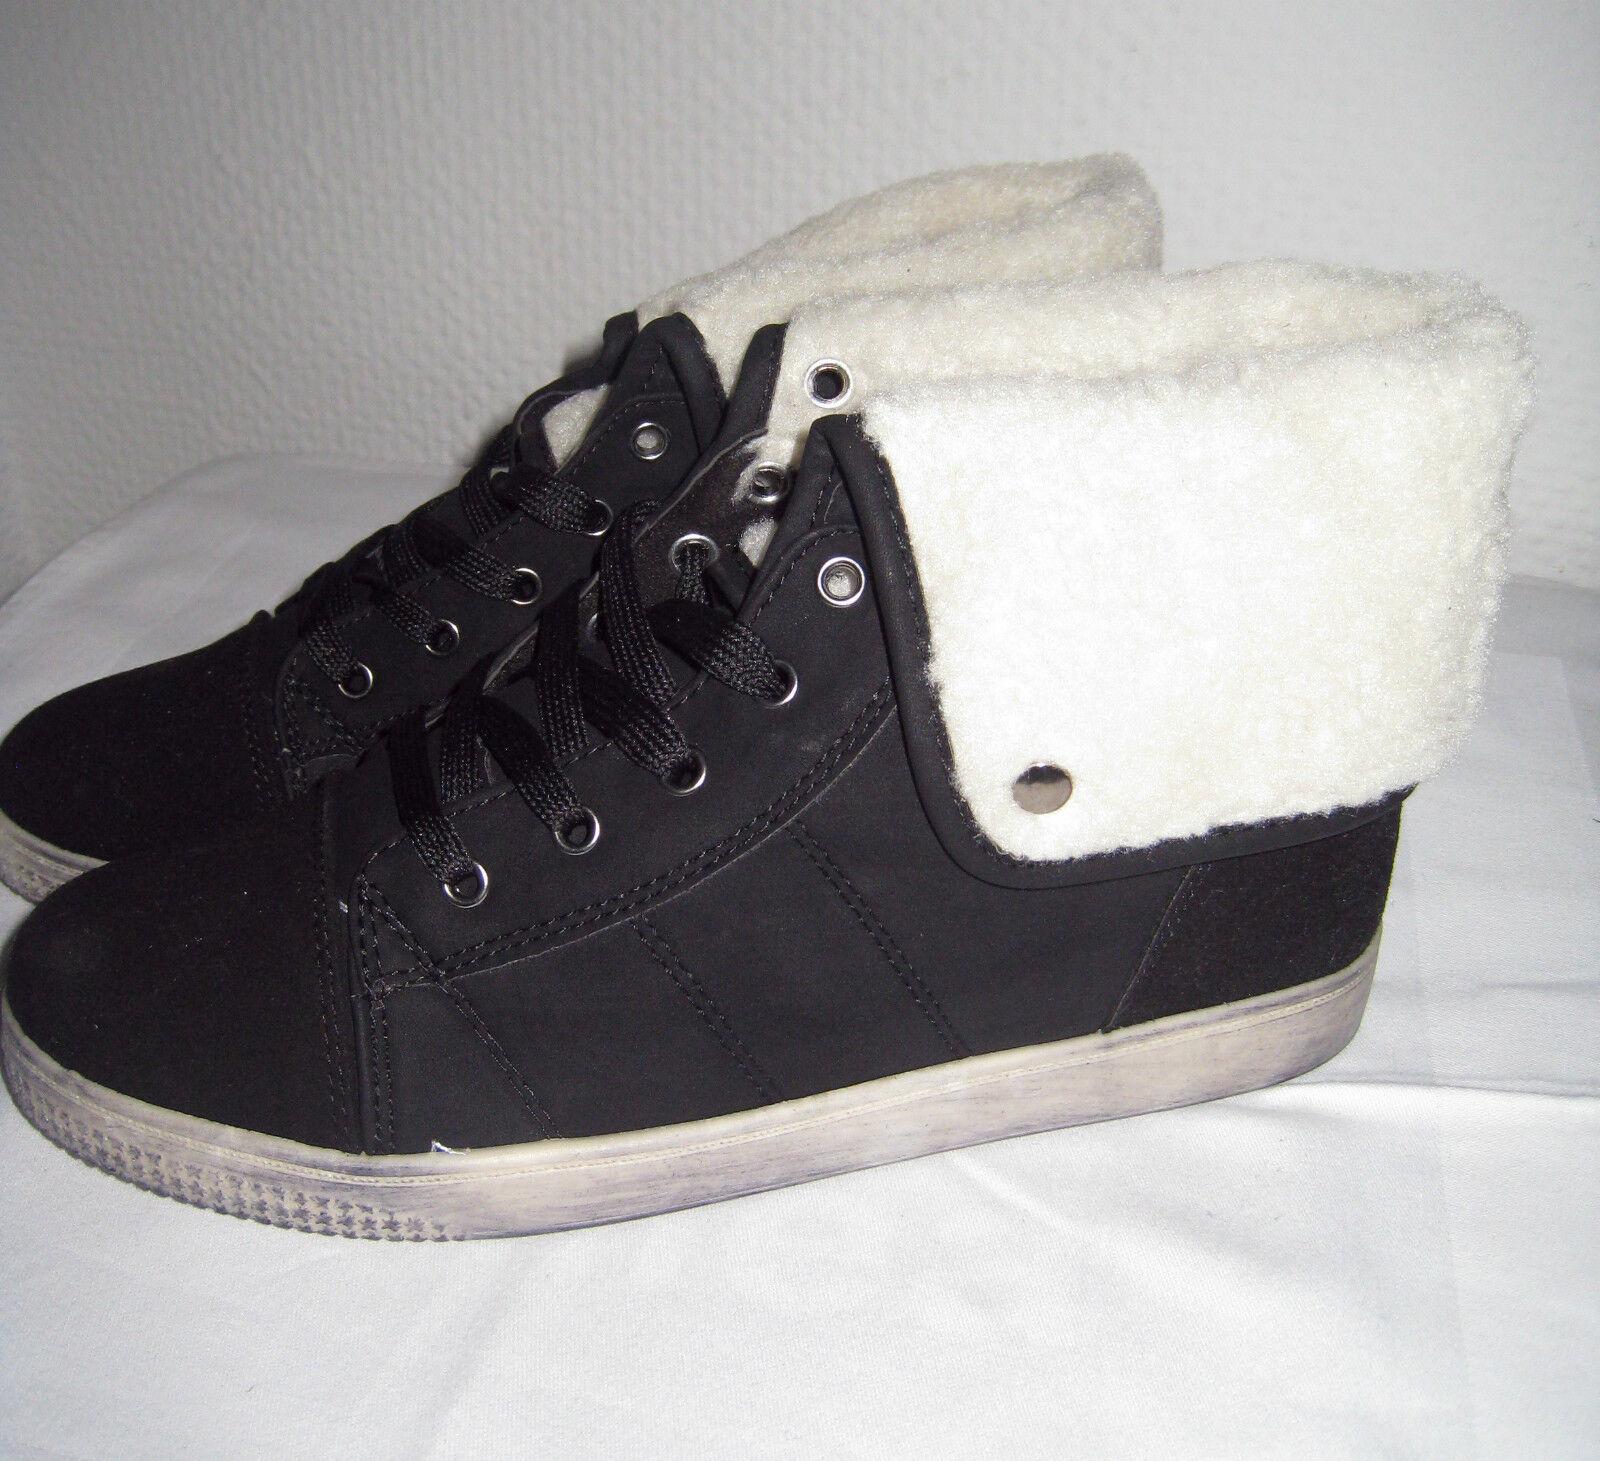 Kayla Shoes ym1514 Da Donna High-Top Sneaker ym1514 Shoes 12 COPPIA (/coppia) Rimanenze! 17ca0d